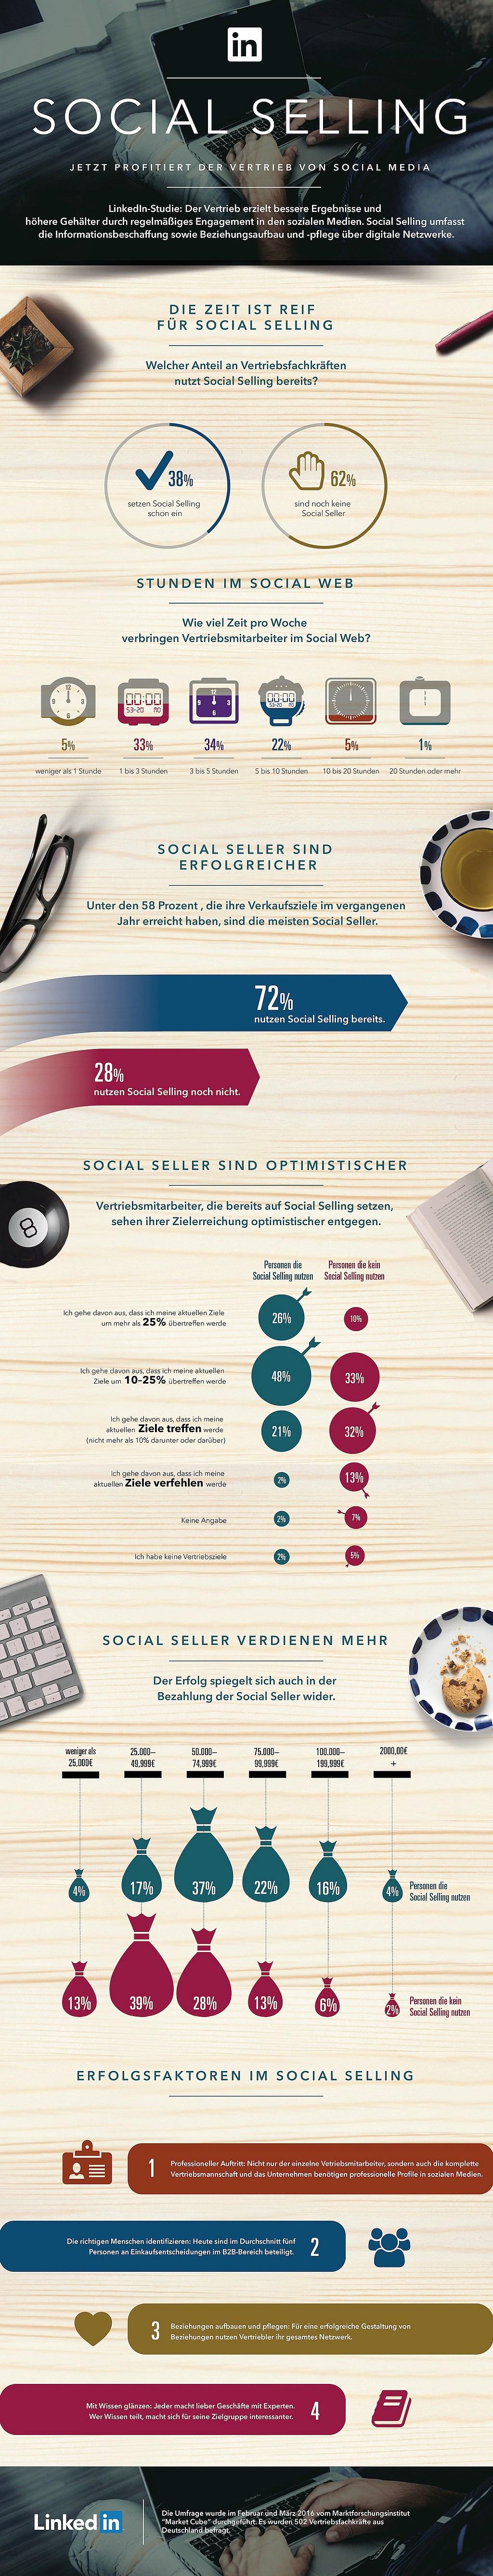 infografik linkedin social selling studie